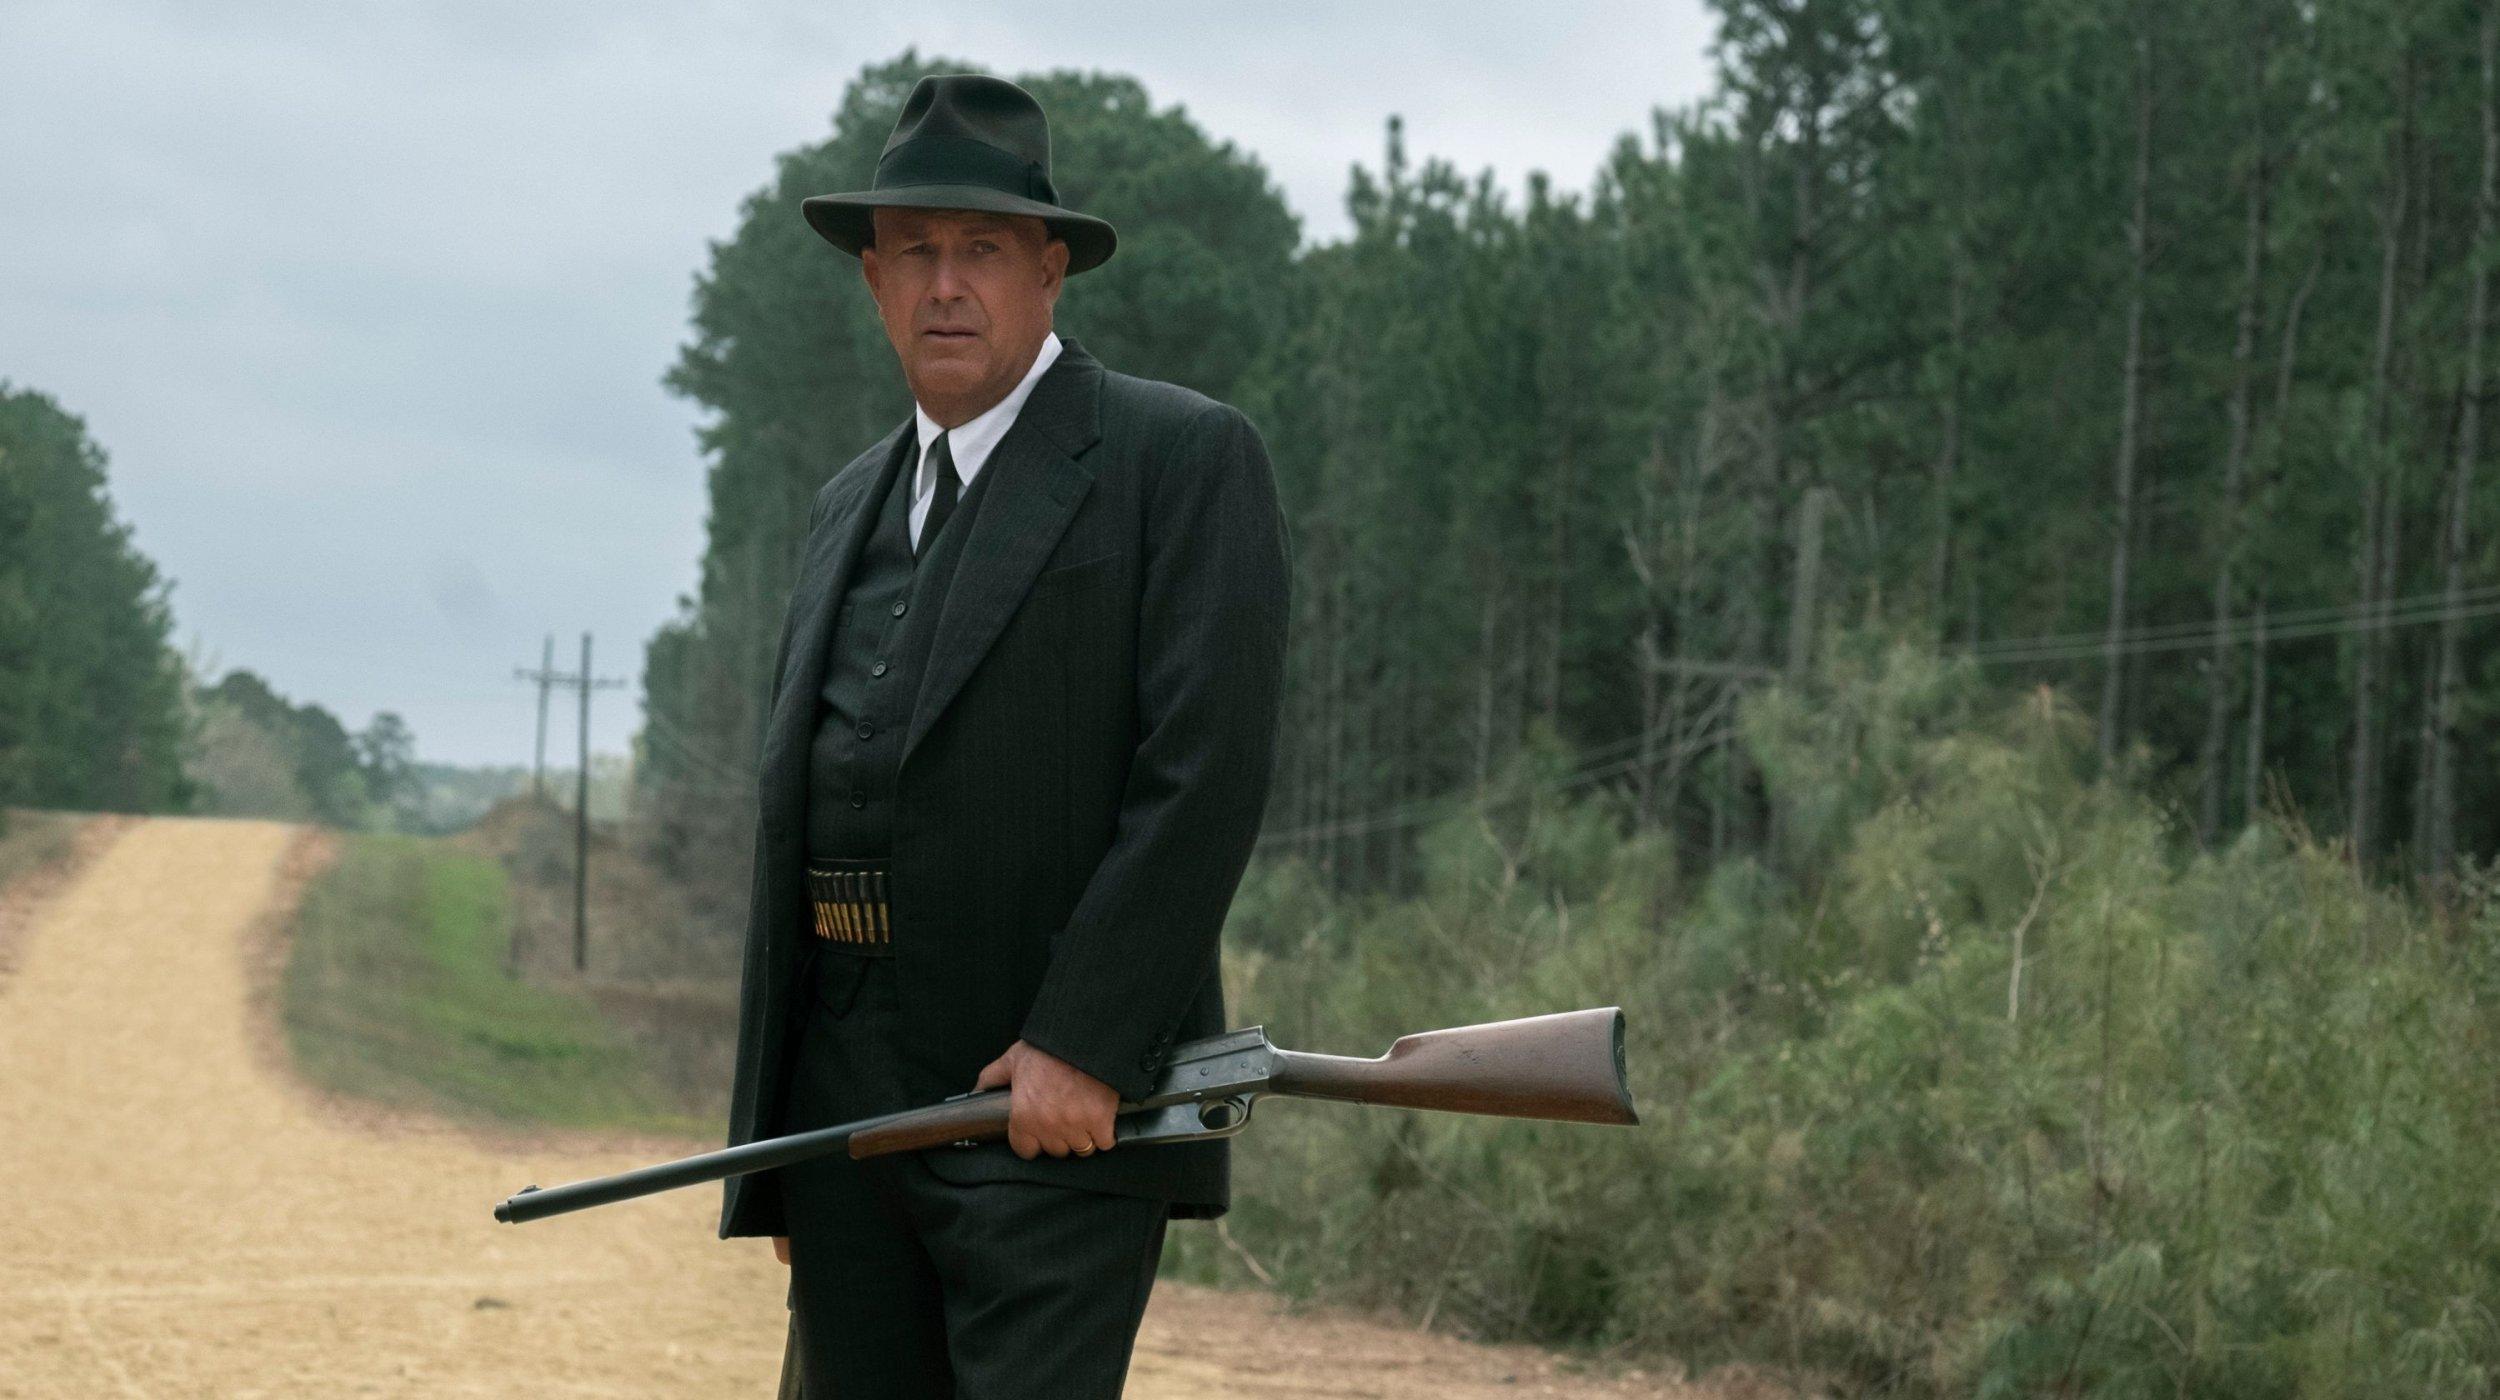 the-highwaymen-true-story-netflix-movie-bonnie-clyde-frank-hamer